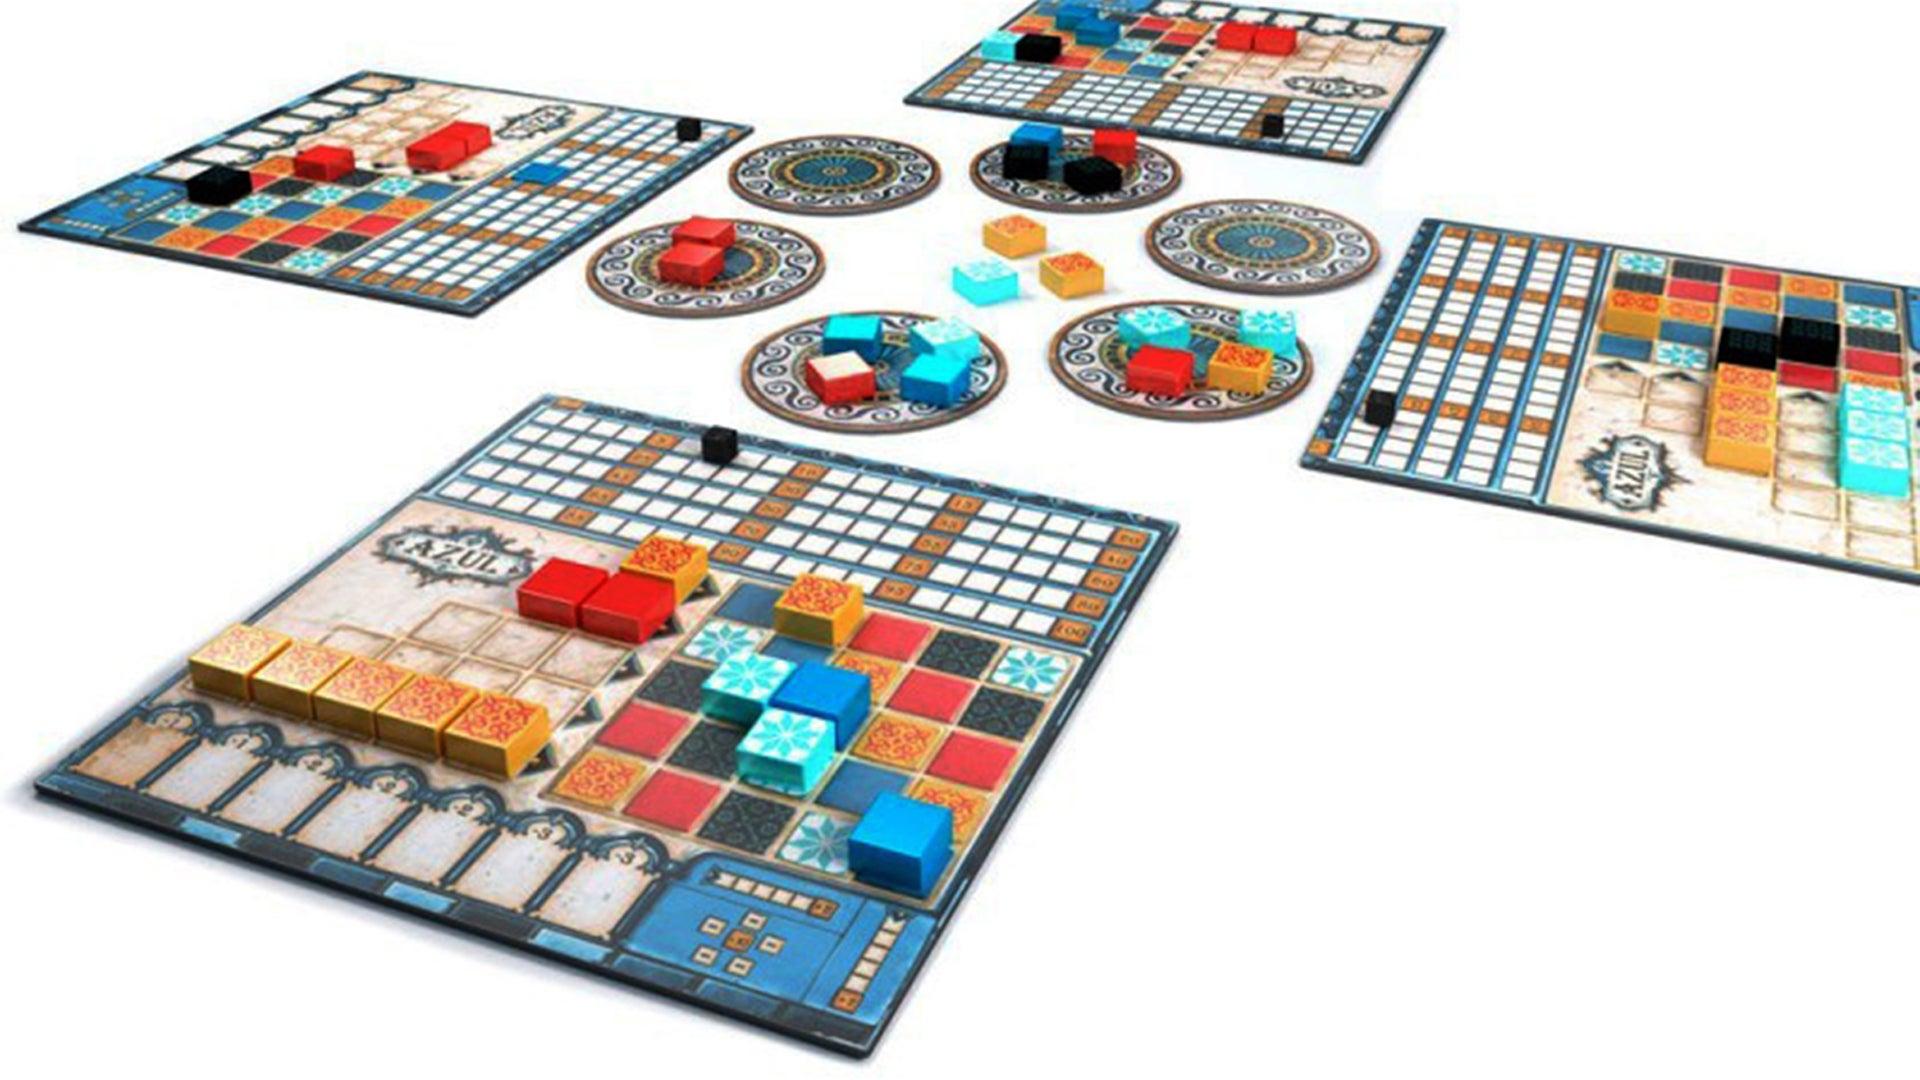 Azul beginner board game gameplay layout